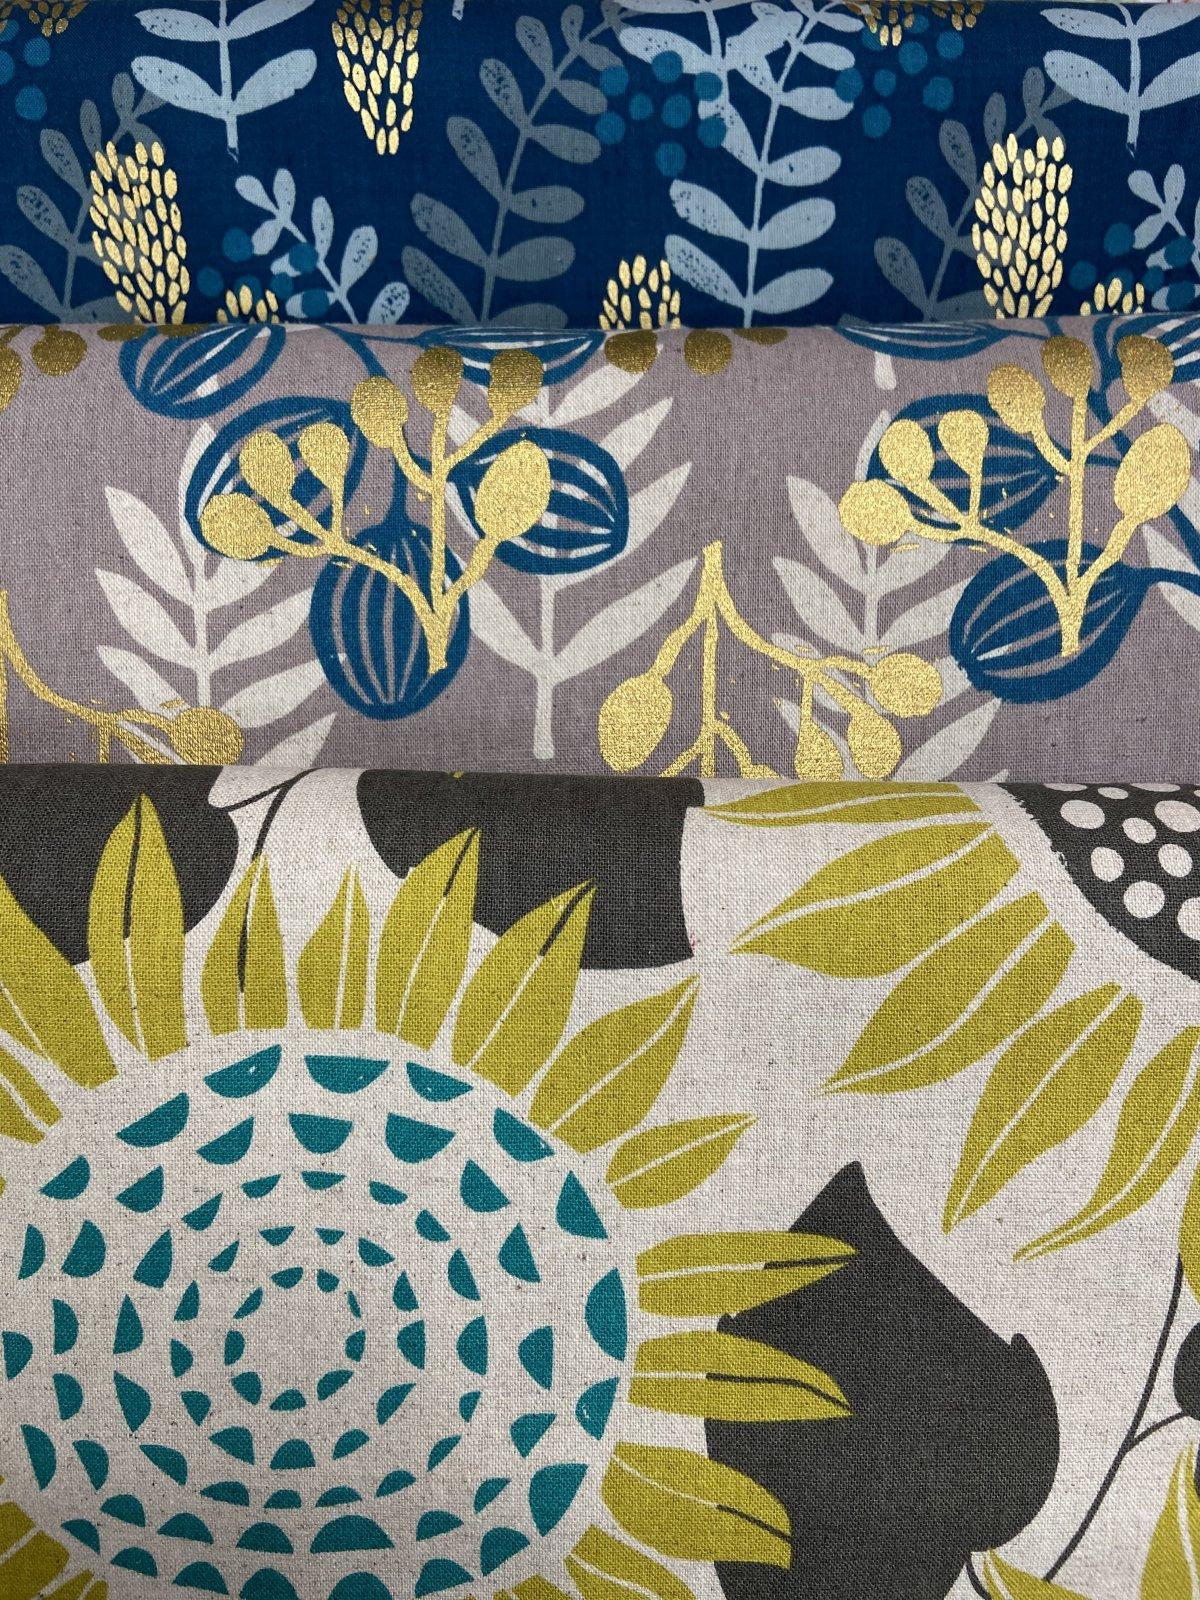 Fresh Cuts Fabric Packs- Cotton Linen Canvas (4x 1/2 Yd Cuts)  - copy